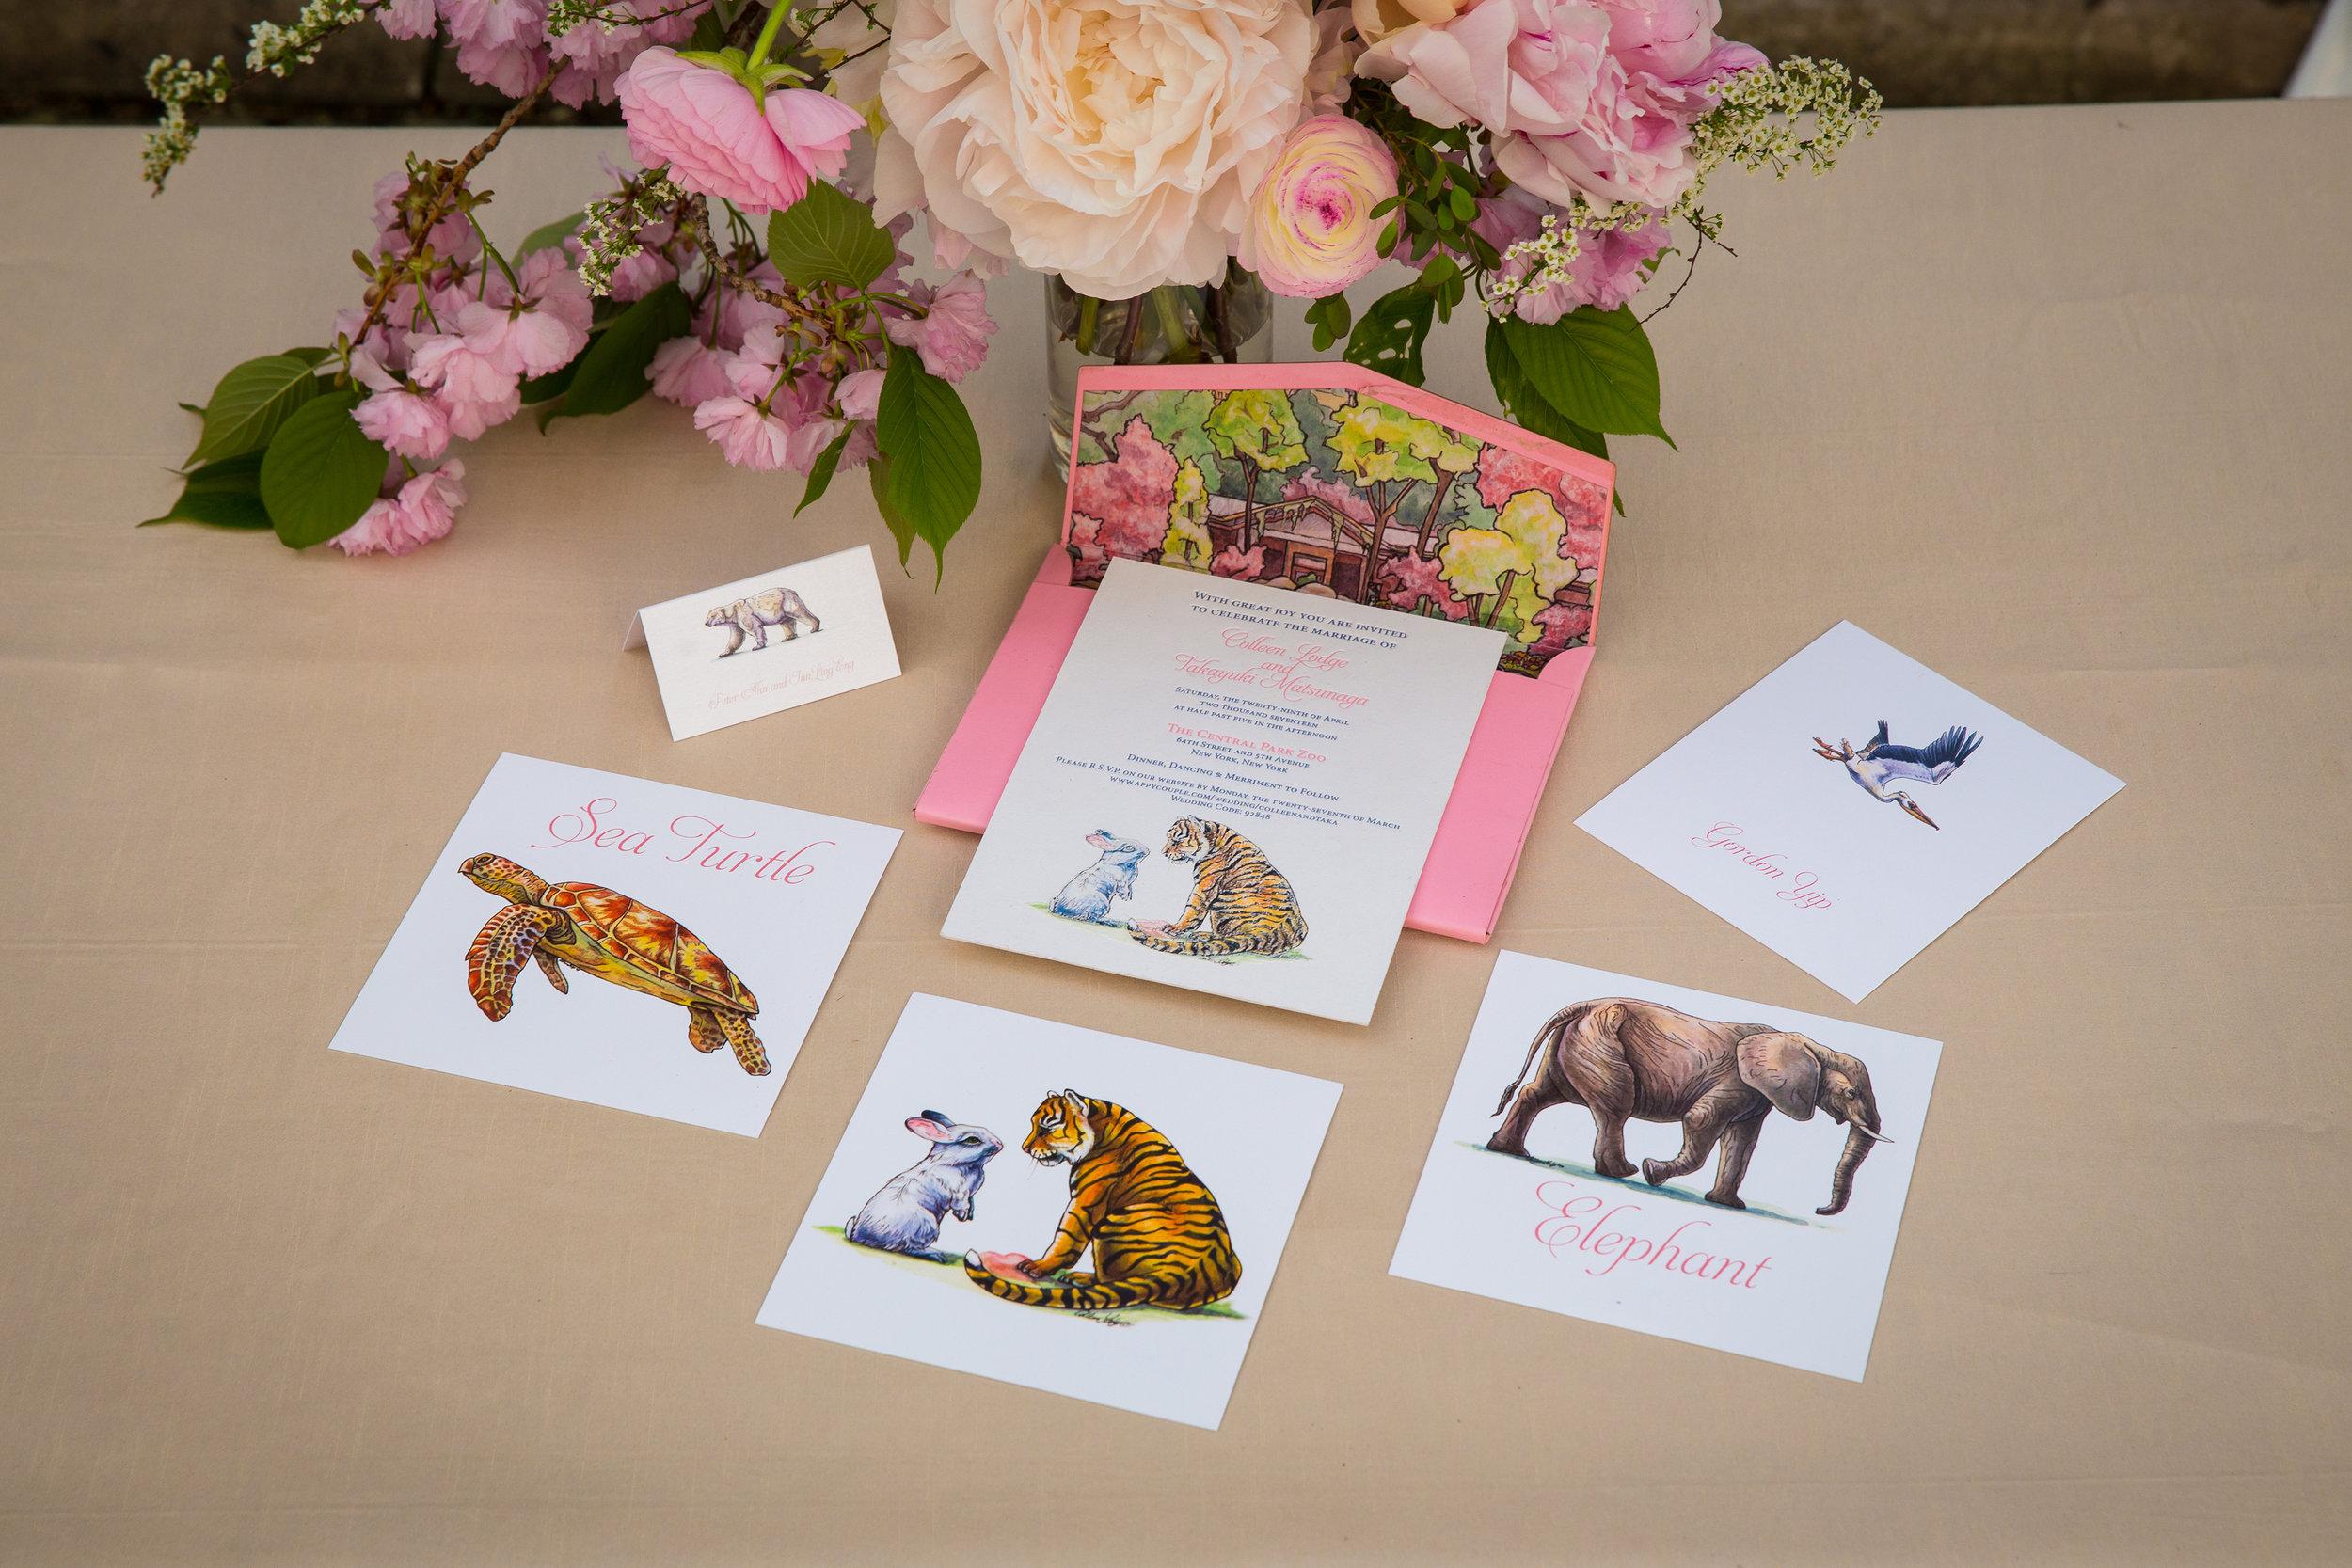 victorious-events-nyc-027-colleen-taka-central-park-zoo-wedding-raymond-hamlin.jpg